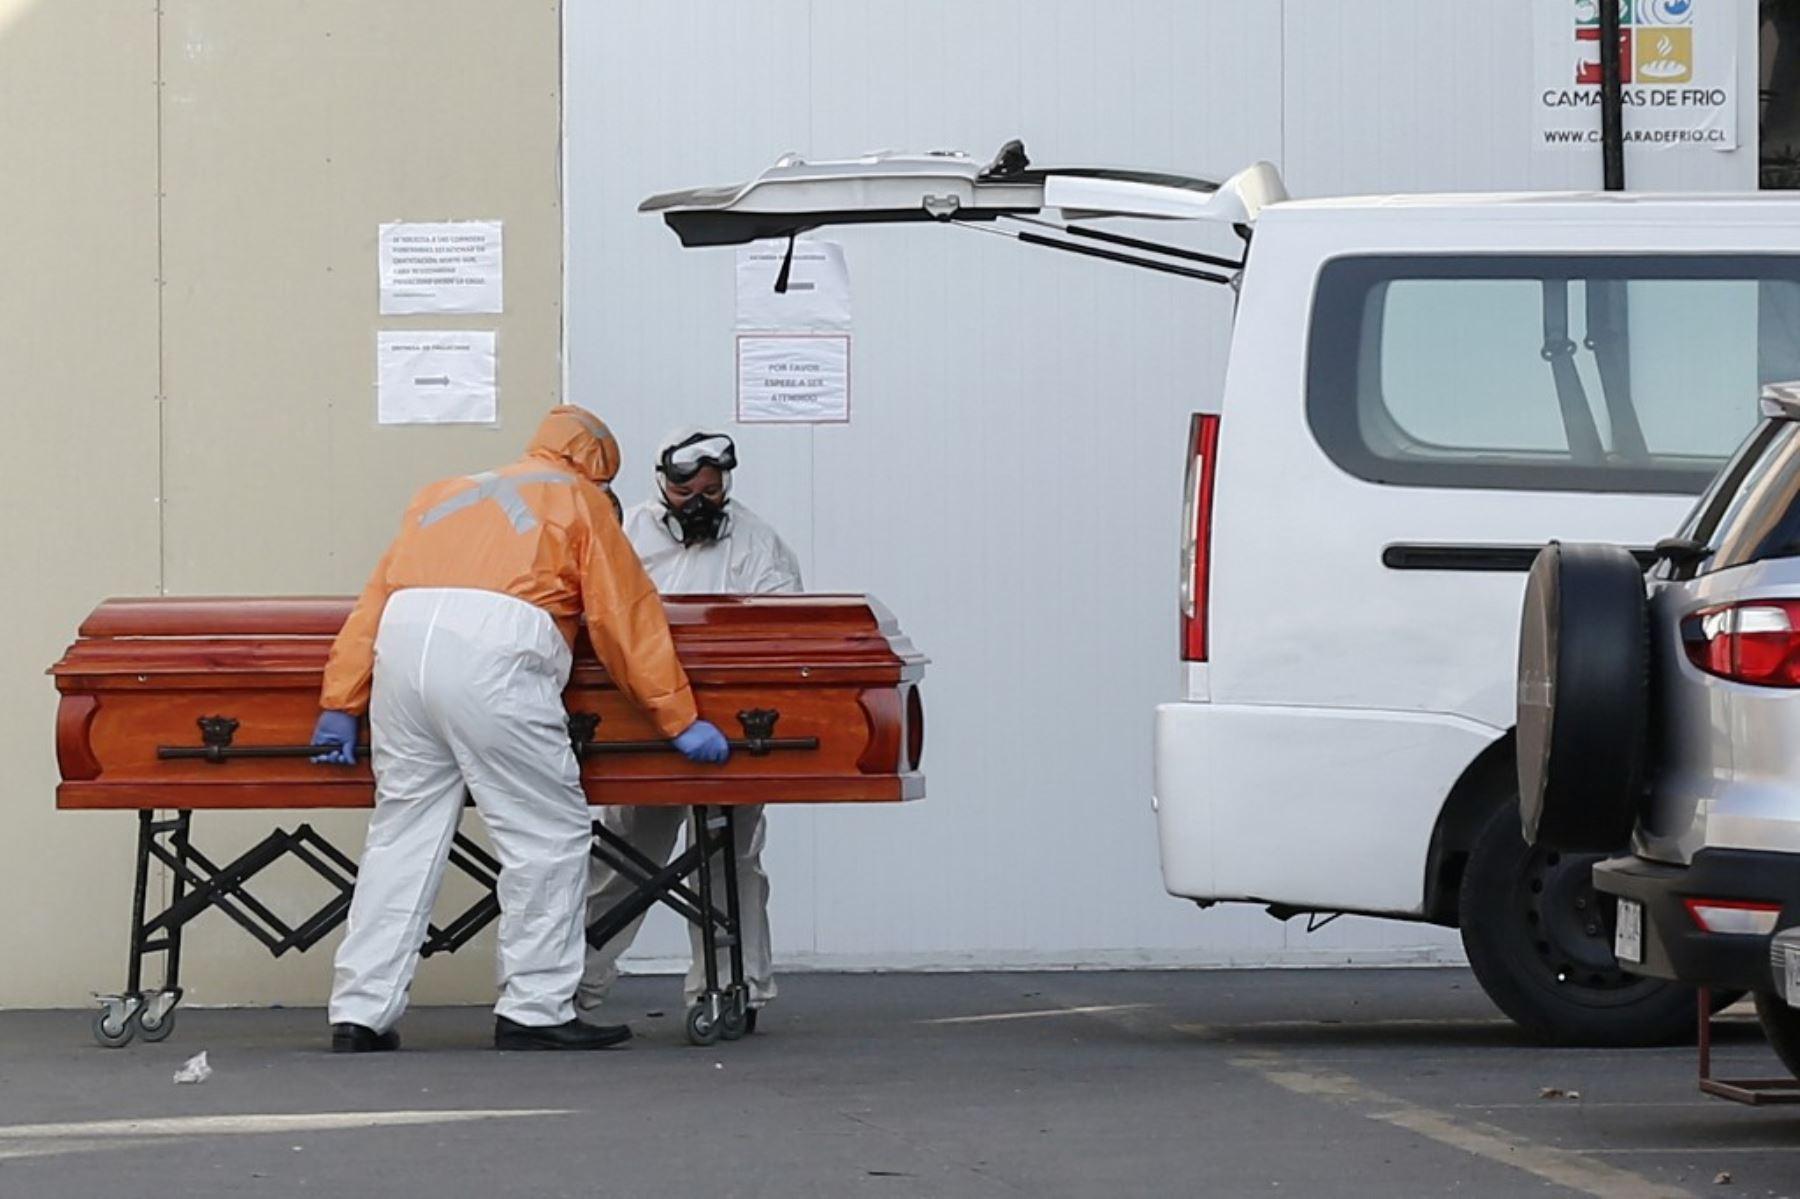 México escala al sexto lugar mundial de muertes con la pandemia ...